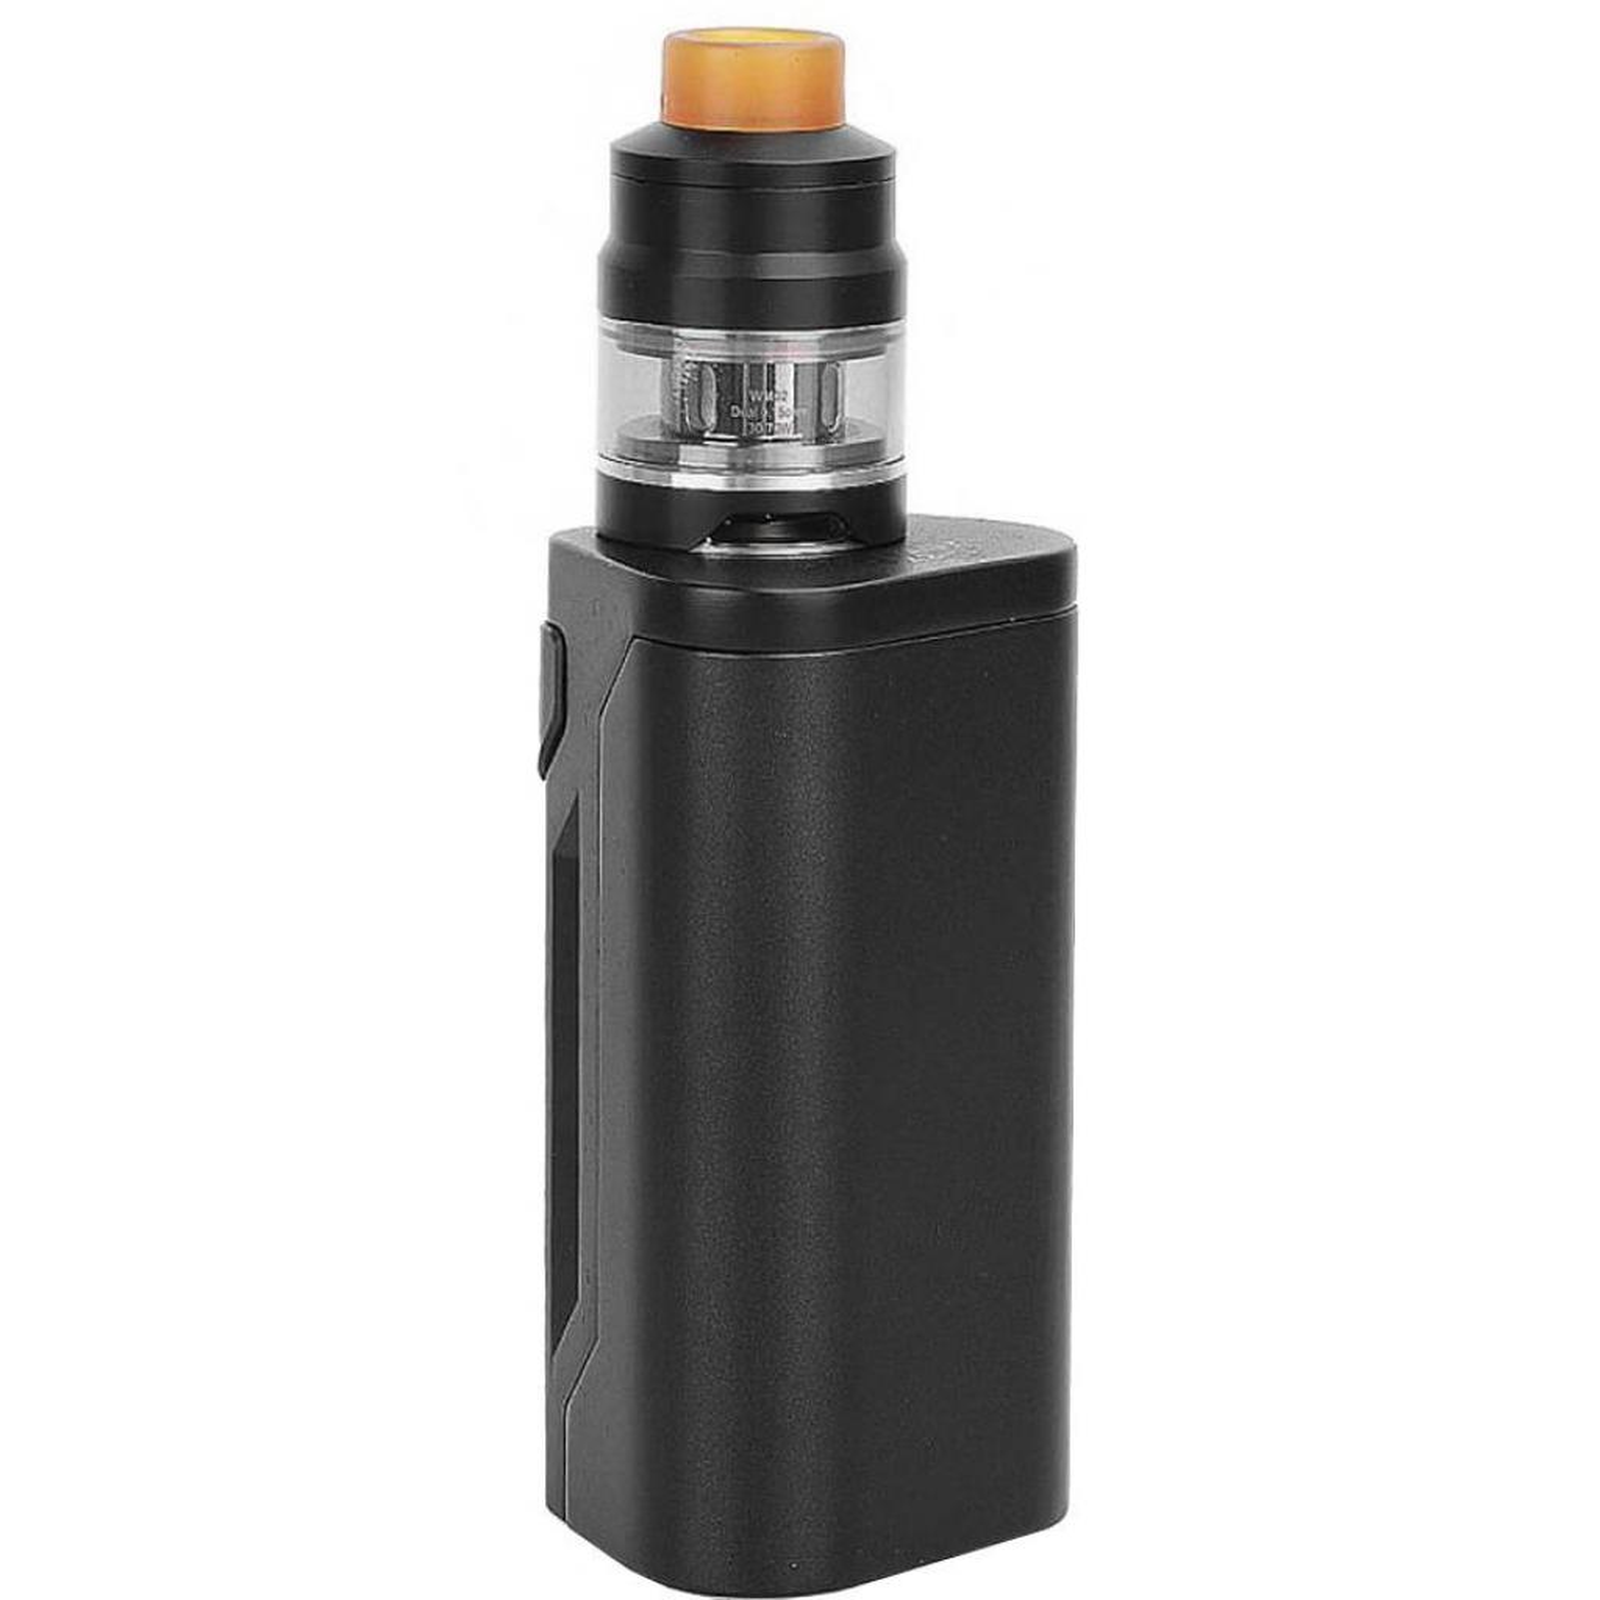 Стартовый набор Wismec Reuleaux RX2 20700 with Gnome Tank Kit Black (WISRX2KBK)